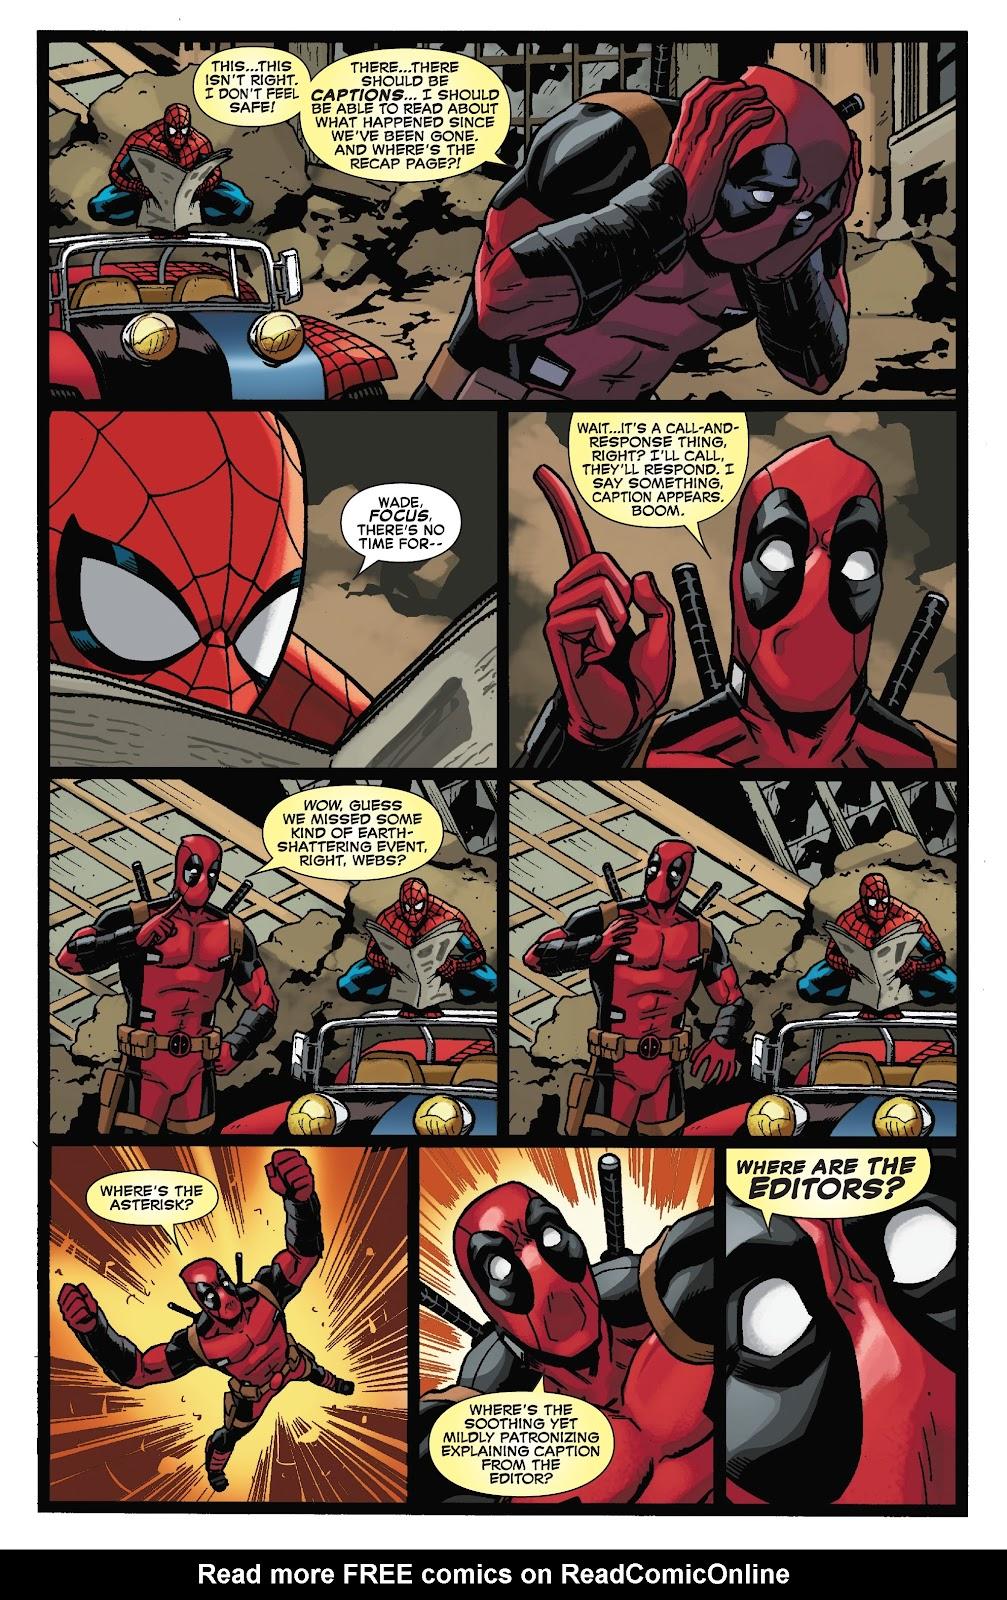 Read online Spider-Man/Deadpool comic -  Issue #46 - 7